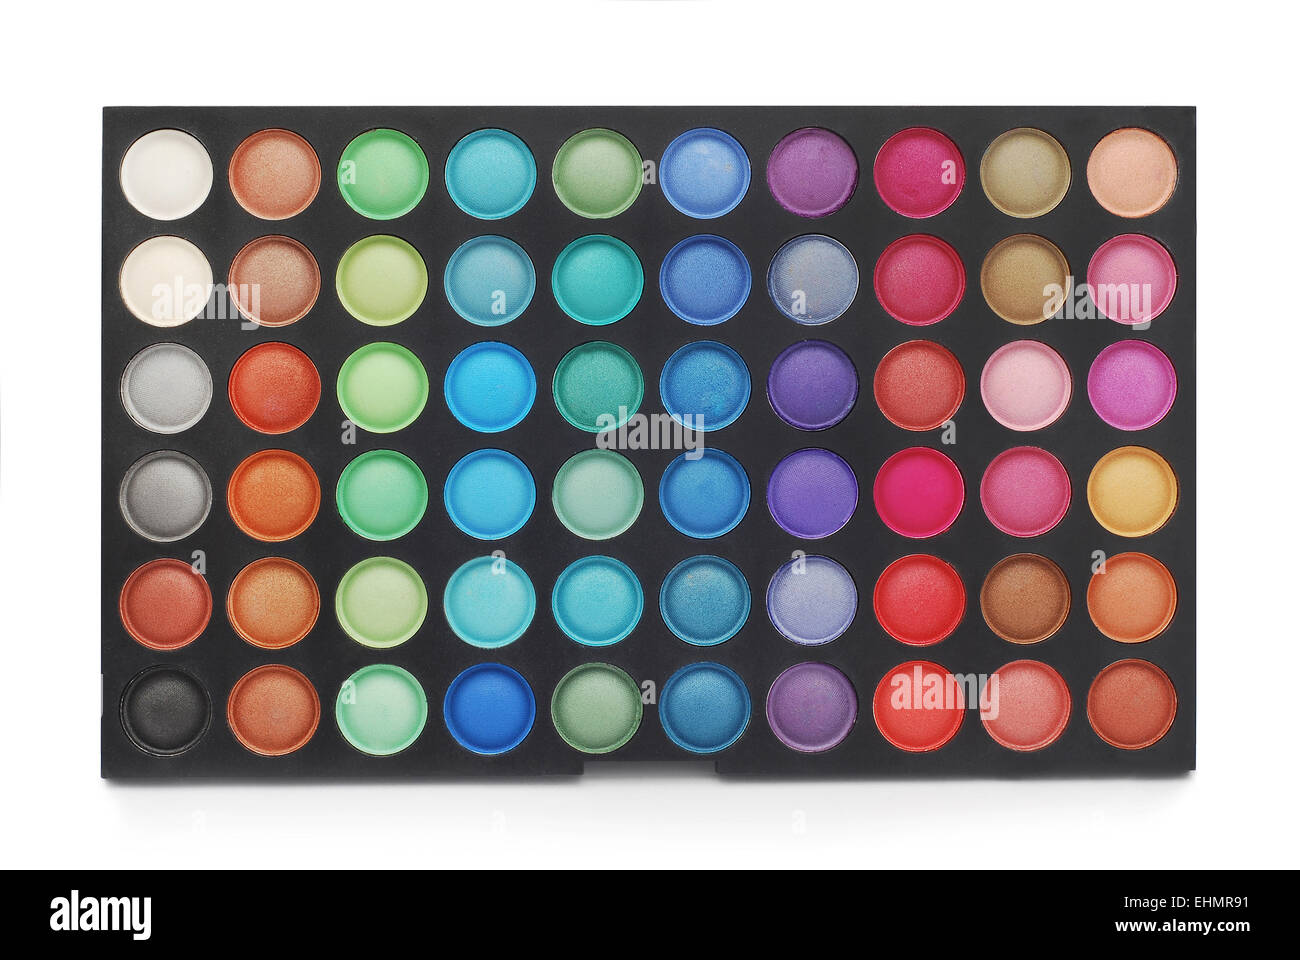 Maquillaje paleta de color blanco Imagen De Stock